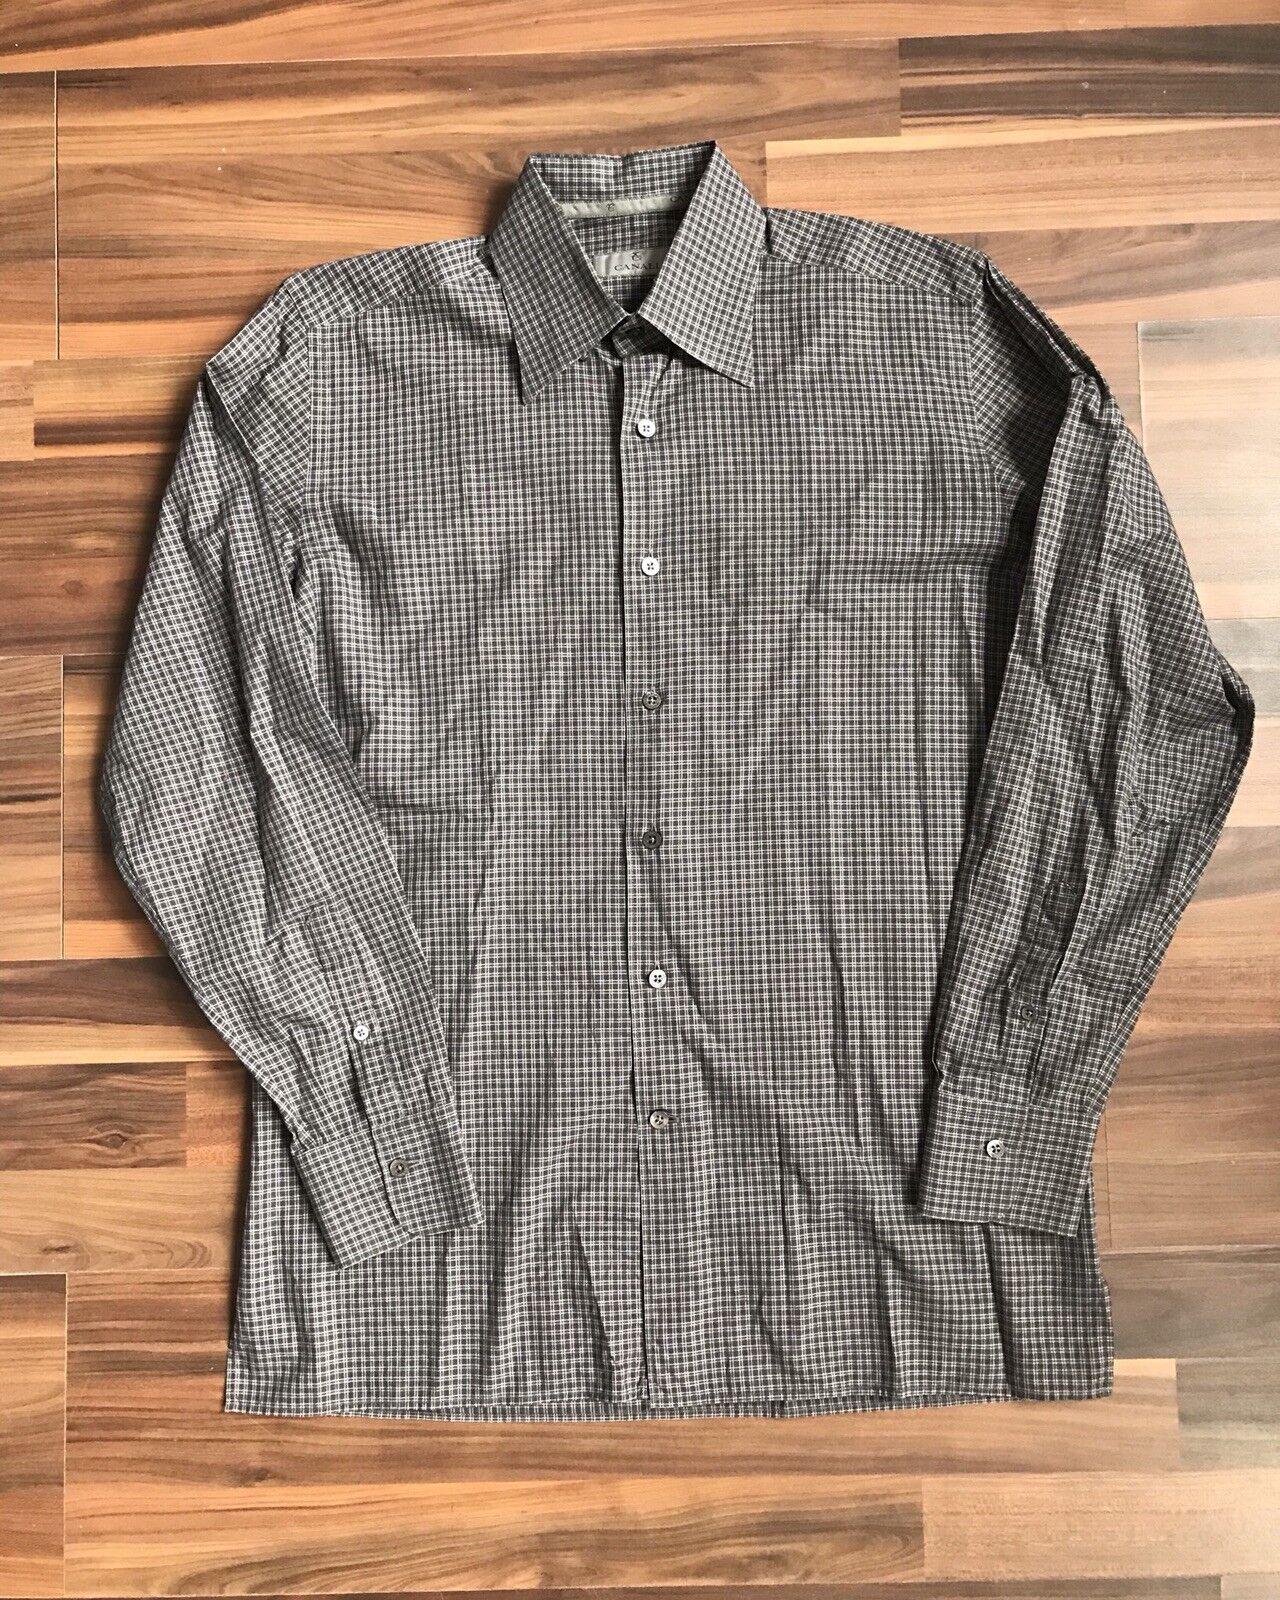 Canali Grey Brown Plaid Button Down Dress Shirt Sz M